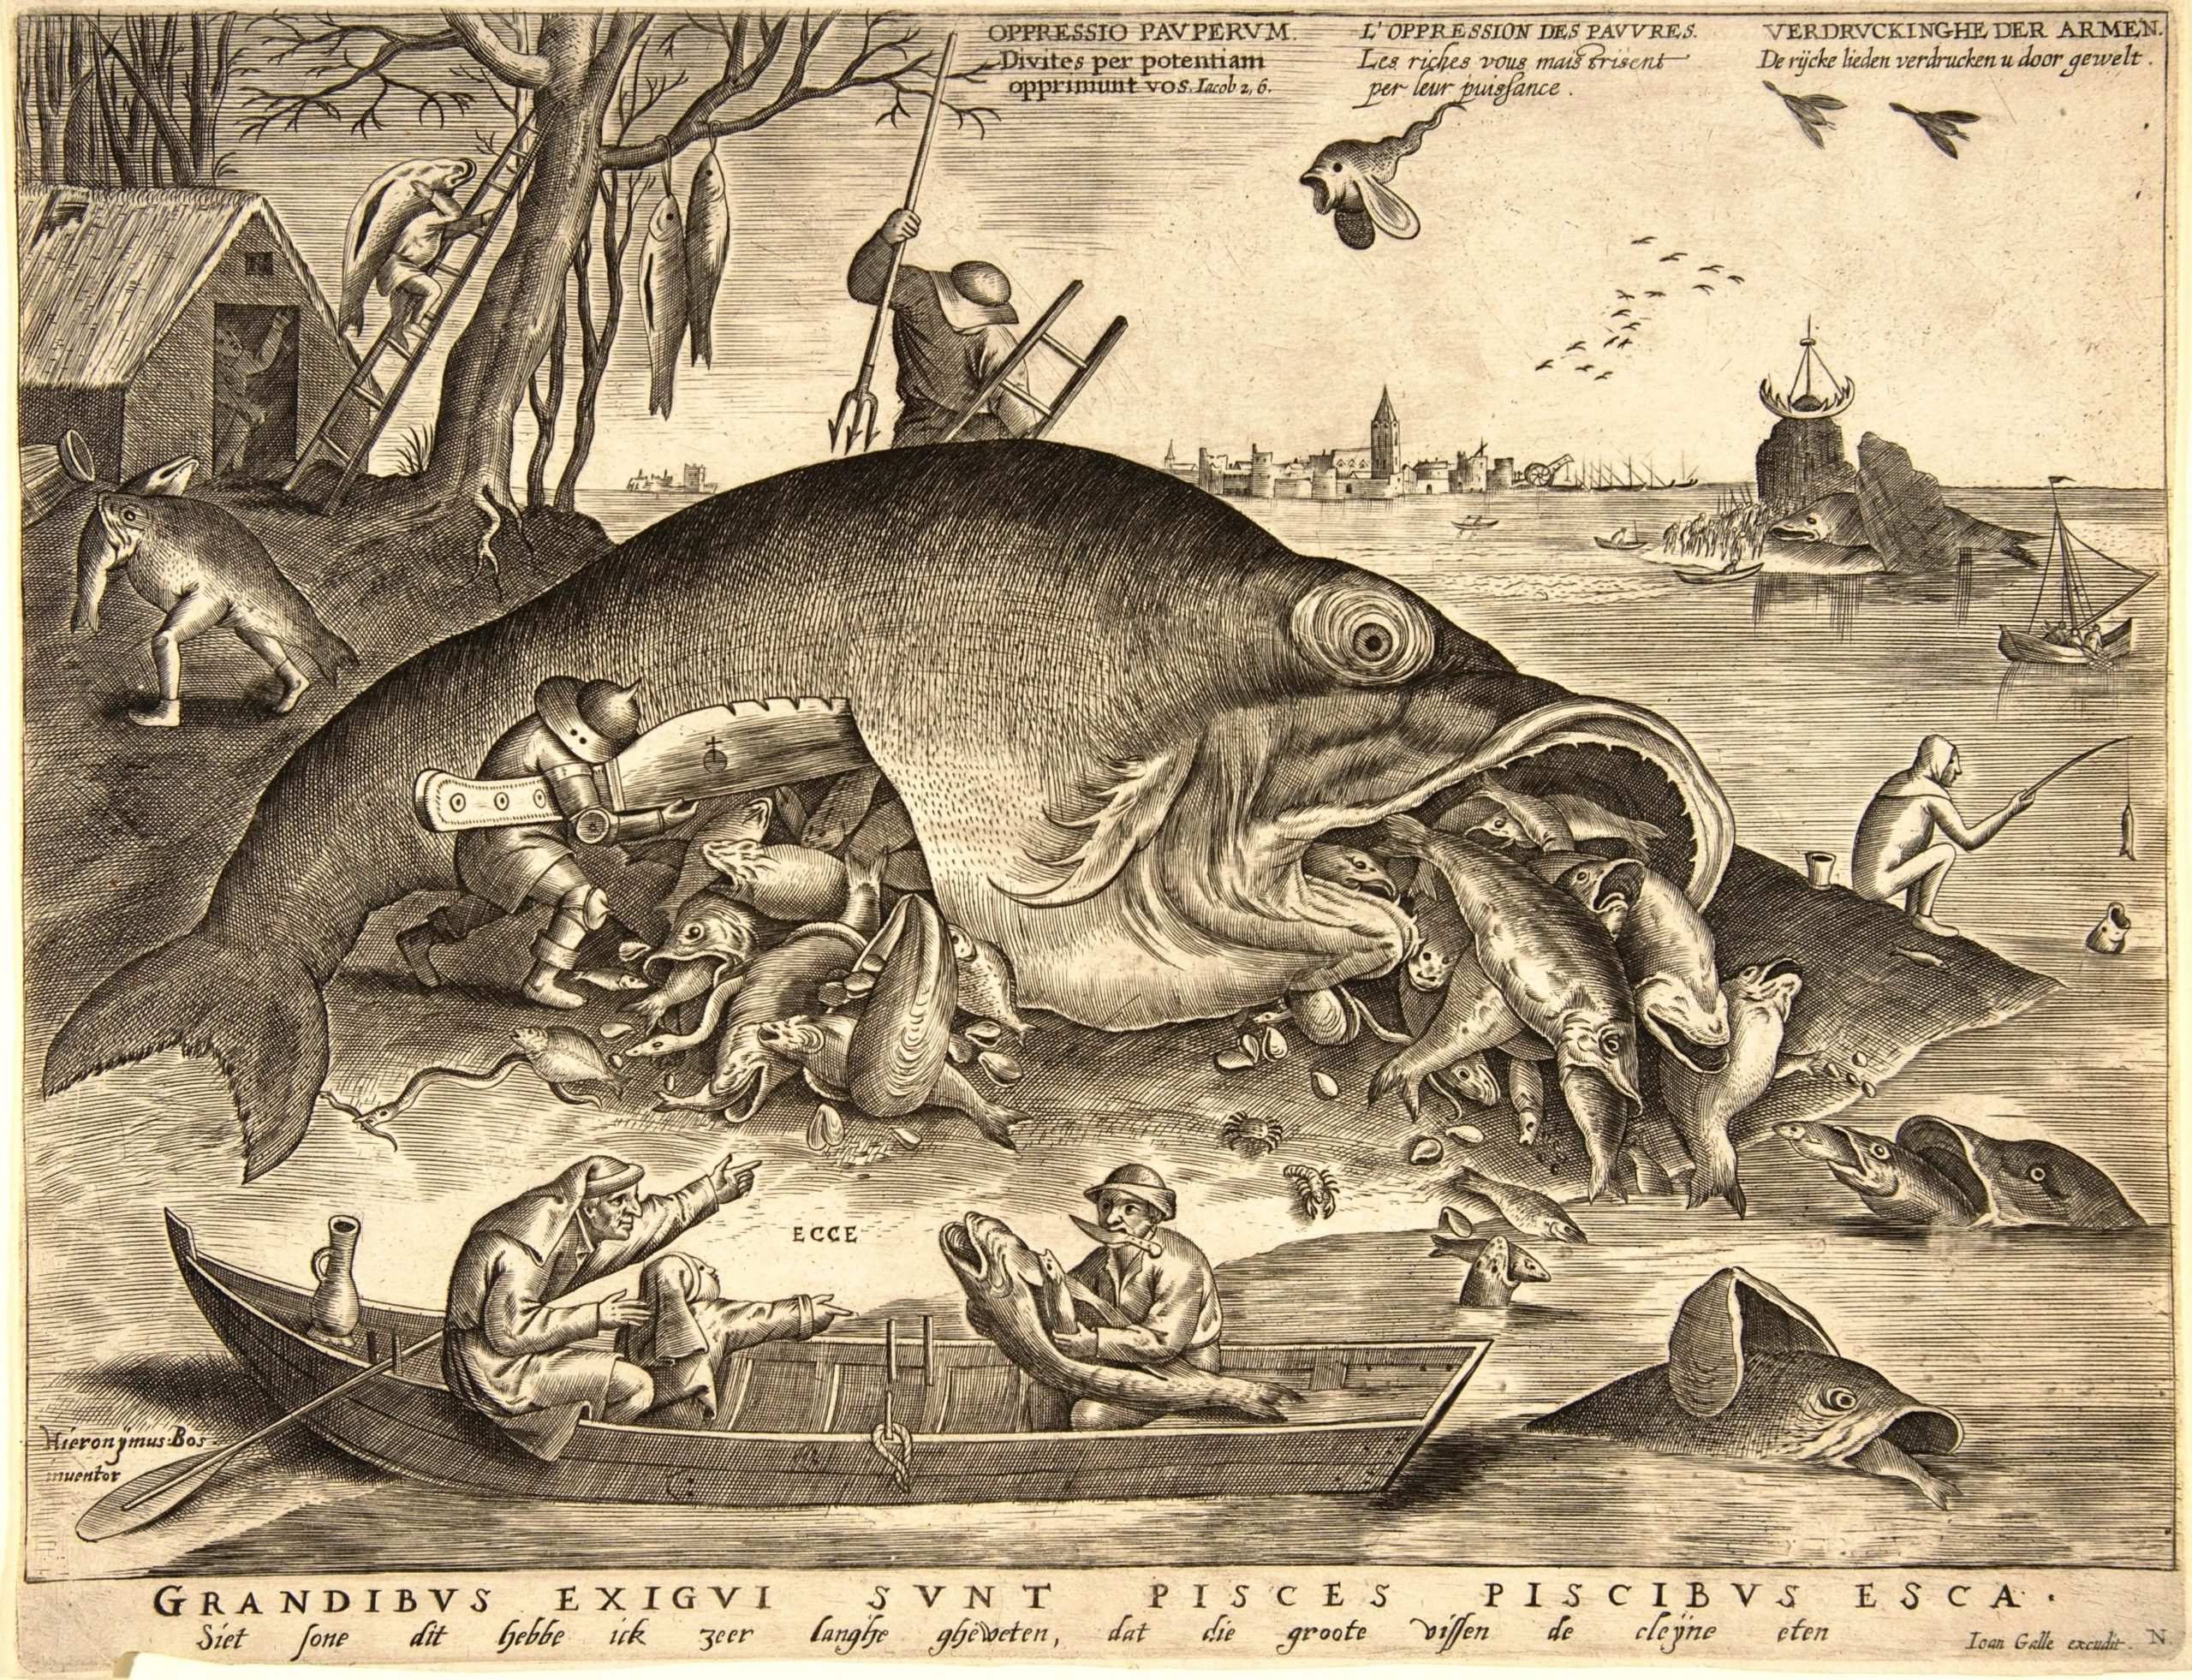 https://semainedelhistoire.com/wp-content/uploads/2021/05/Pieter-Bruegel-lAncien-les-grands-poissons-mangent-les-petits-scaled.jpg